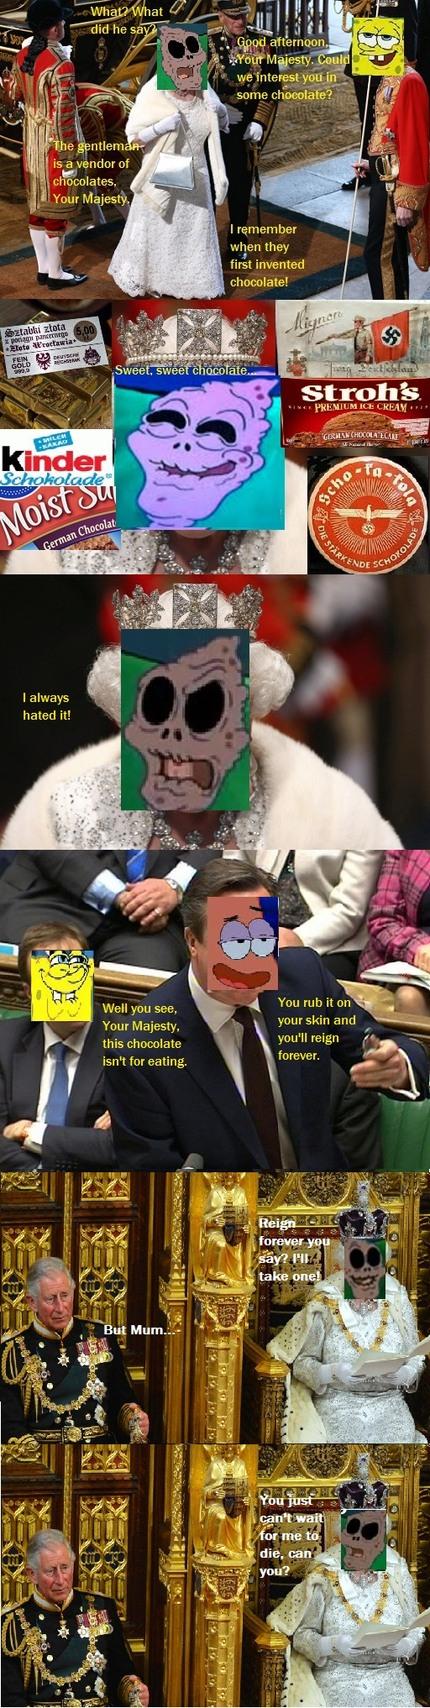 Long live the Queen - meme